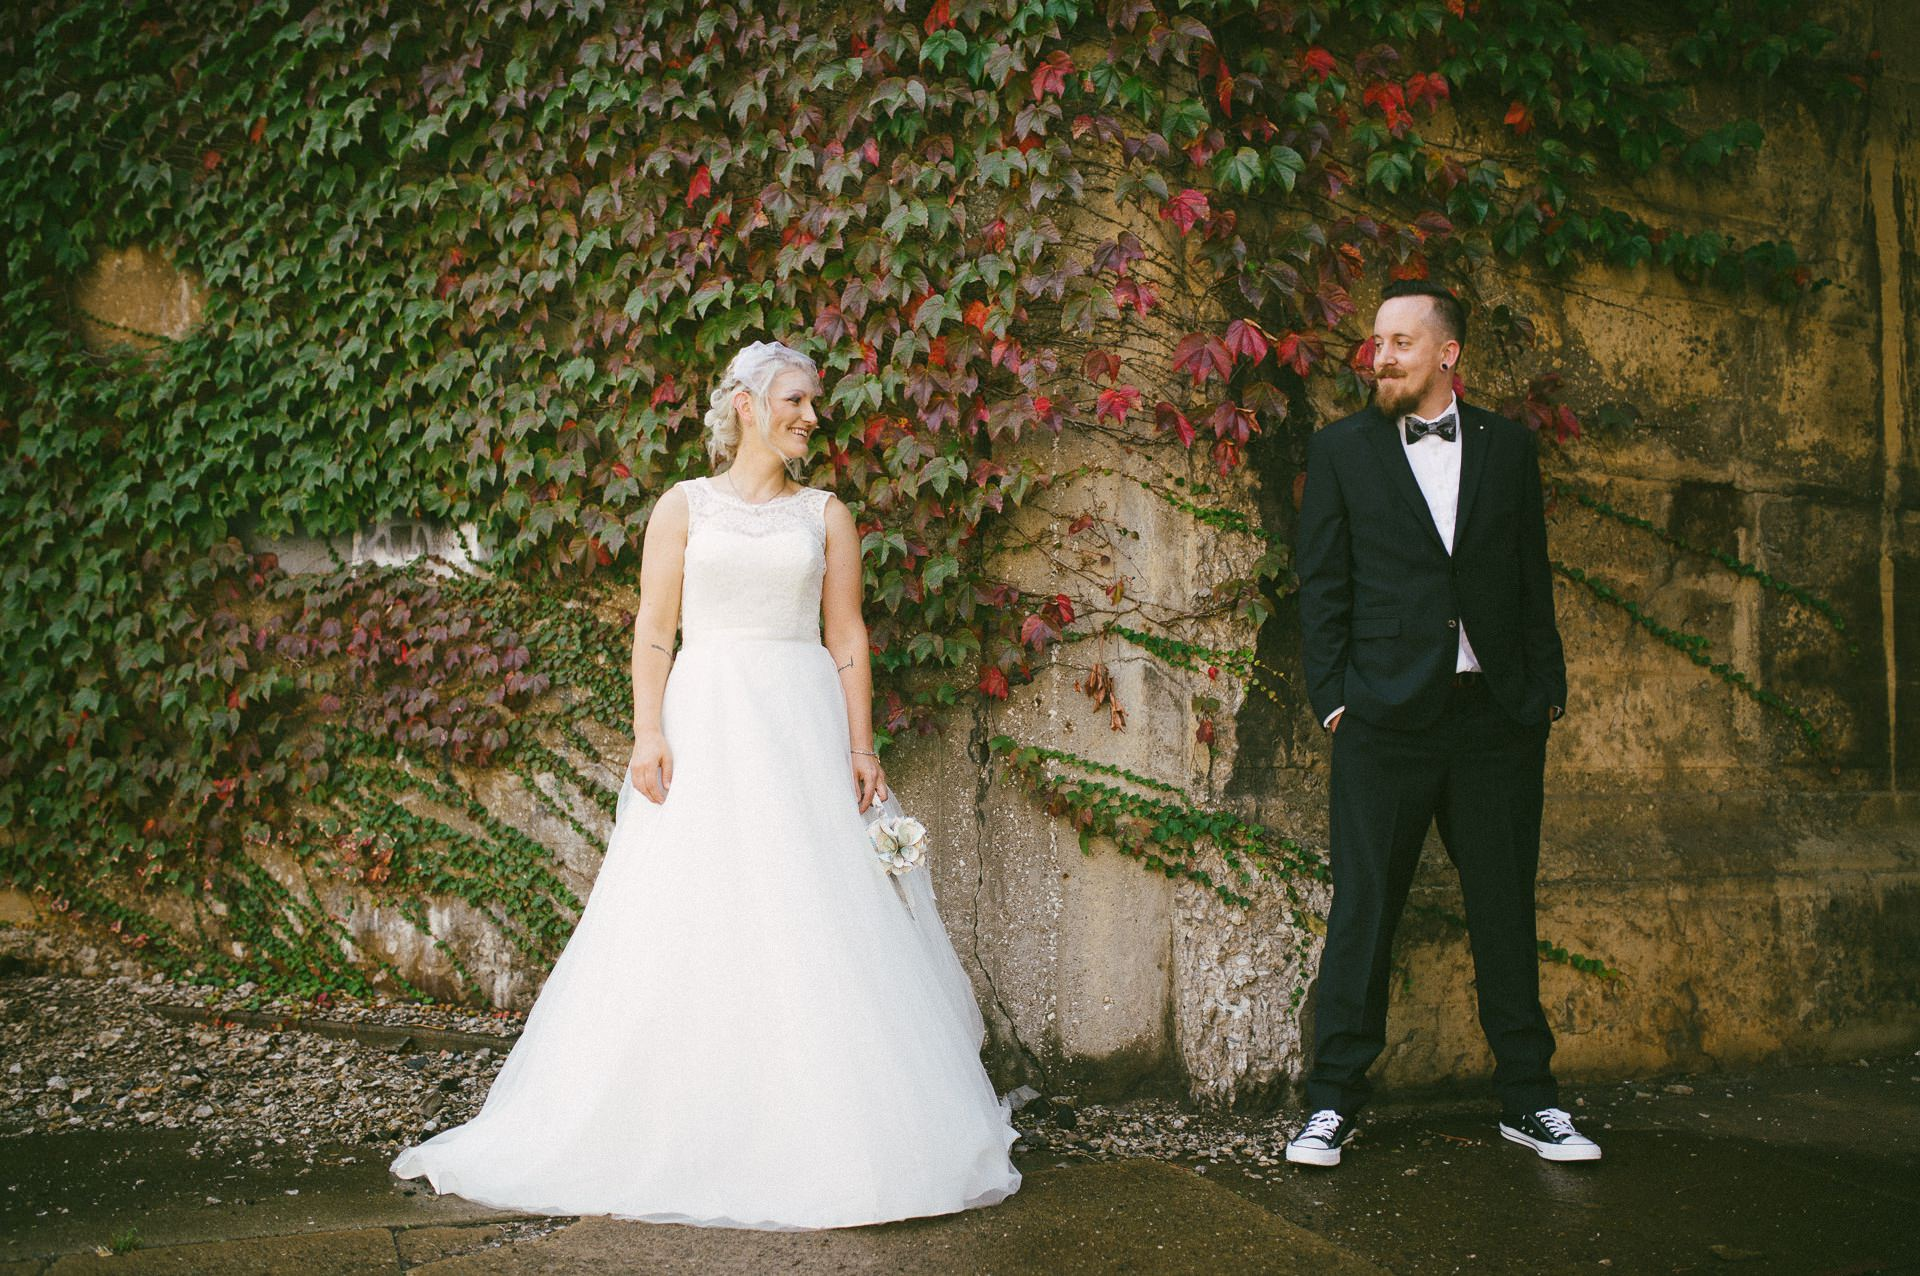 Goldhorn Brewery Wedding Photos in Cleveland 2 4.jpg